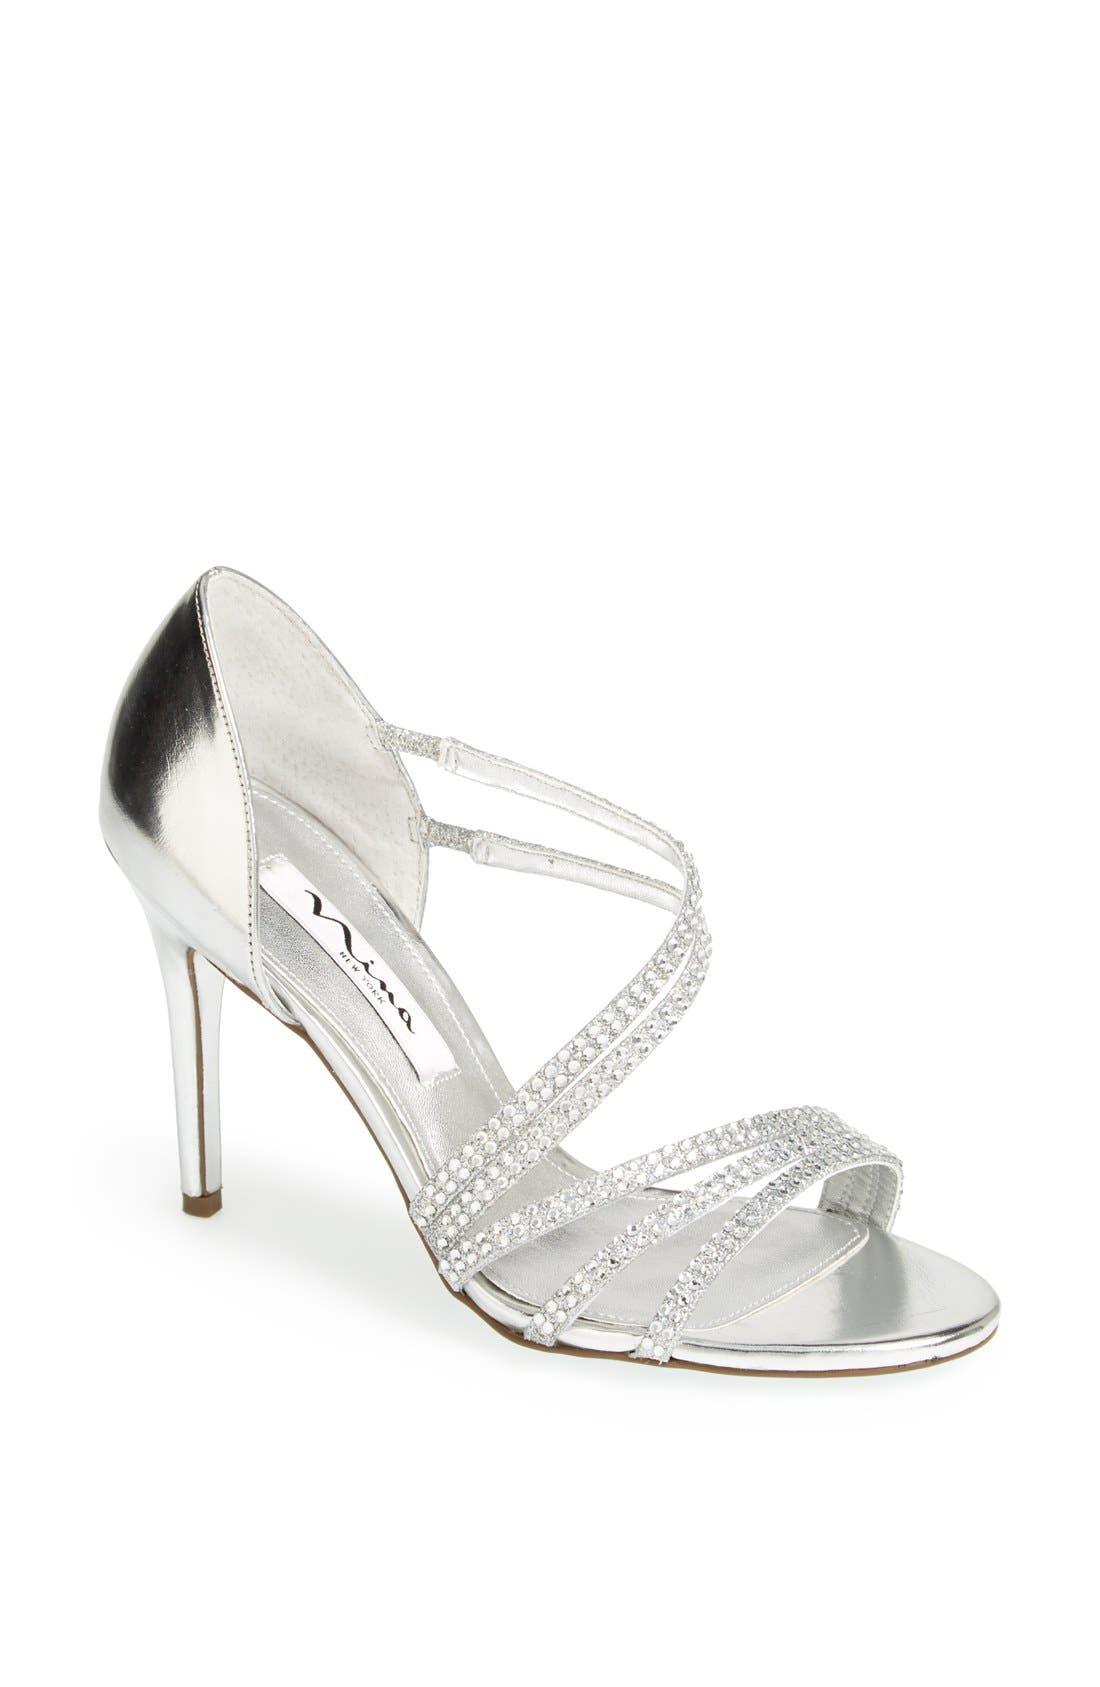 Alternate Image 1 Selected - Nina 'Coretta' Sandal